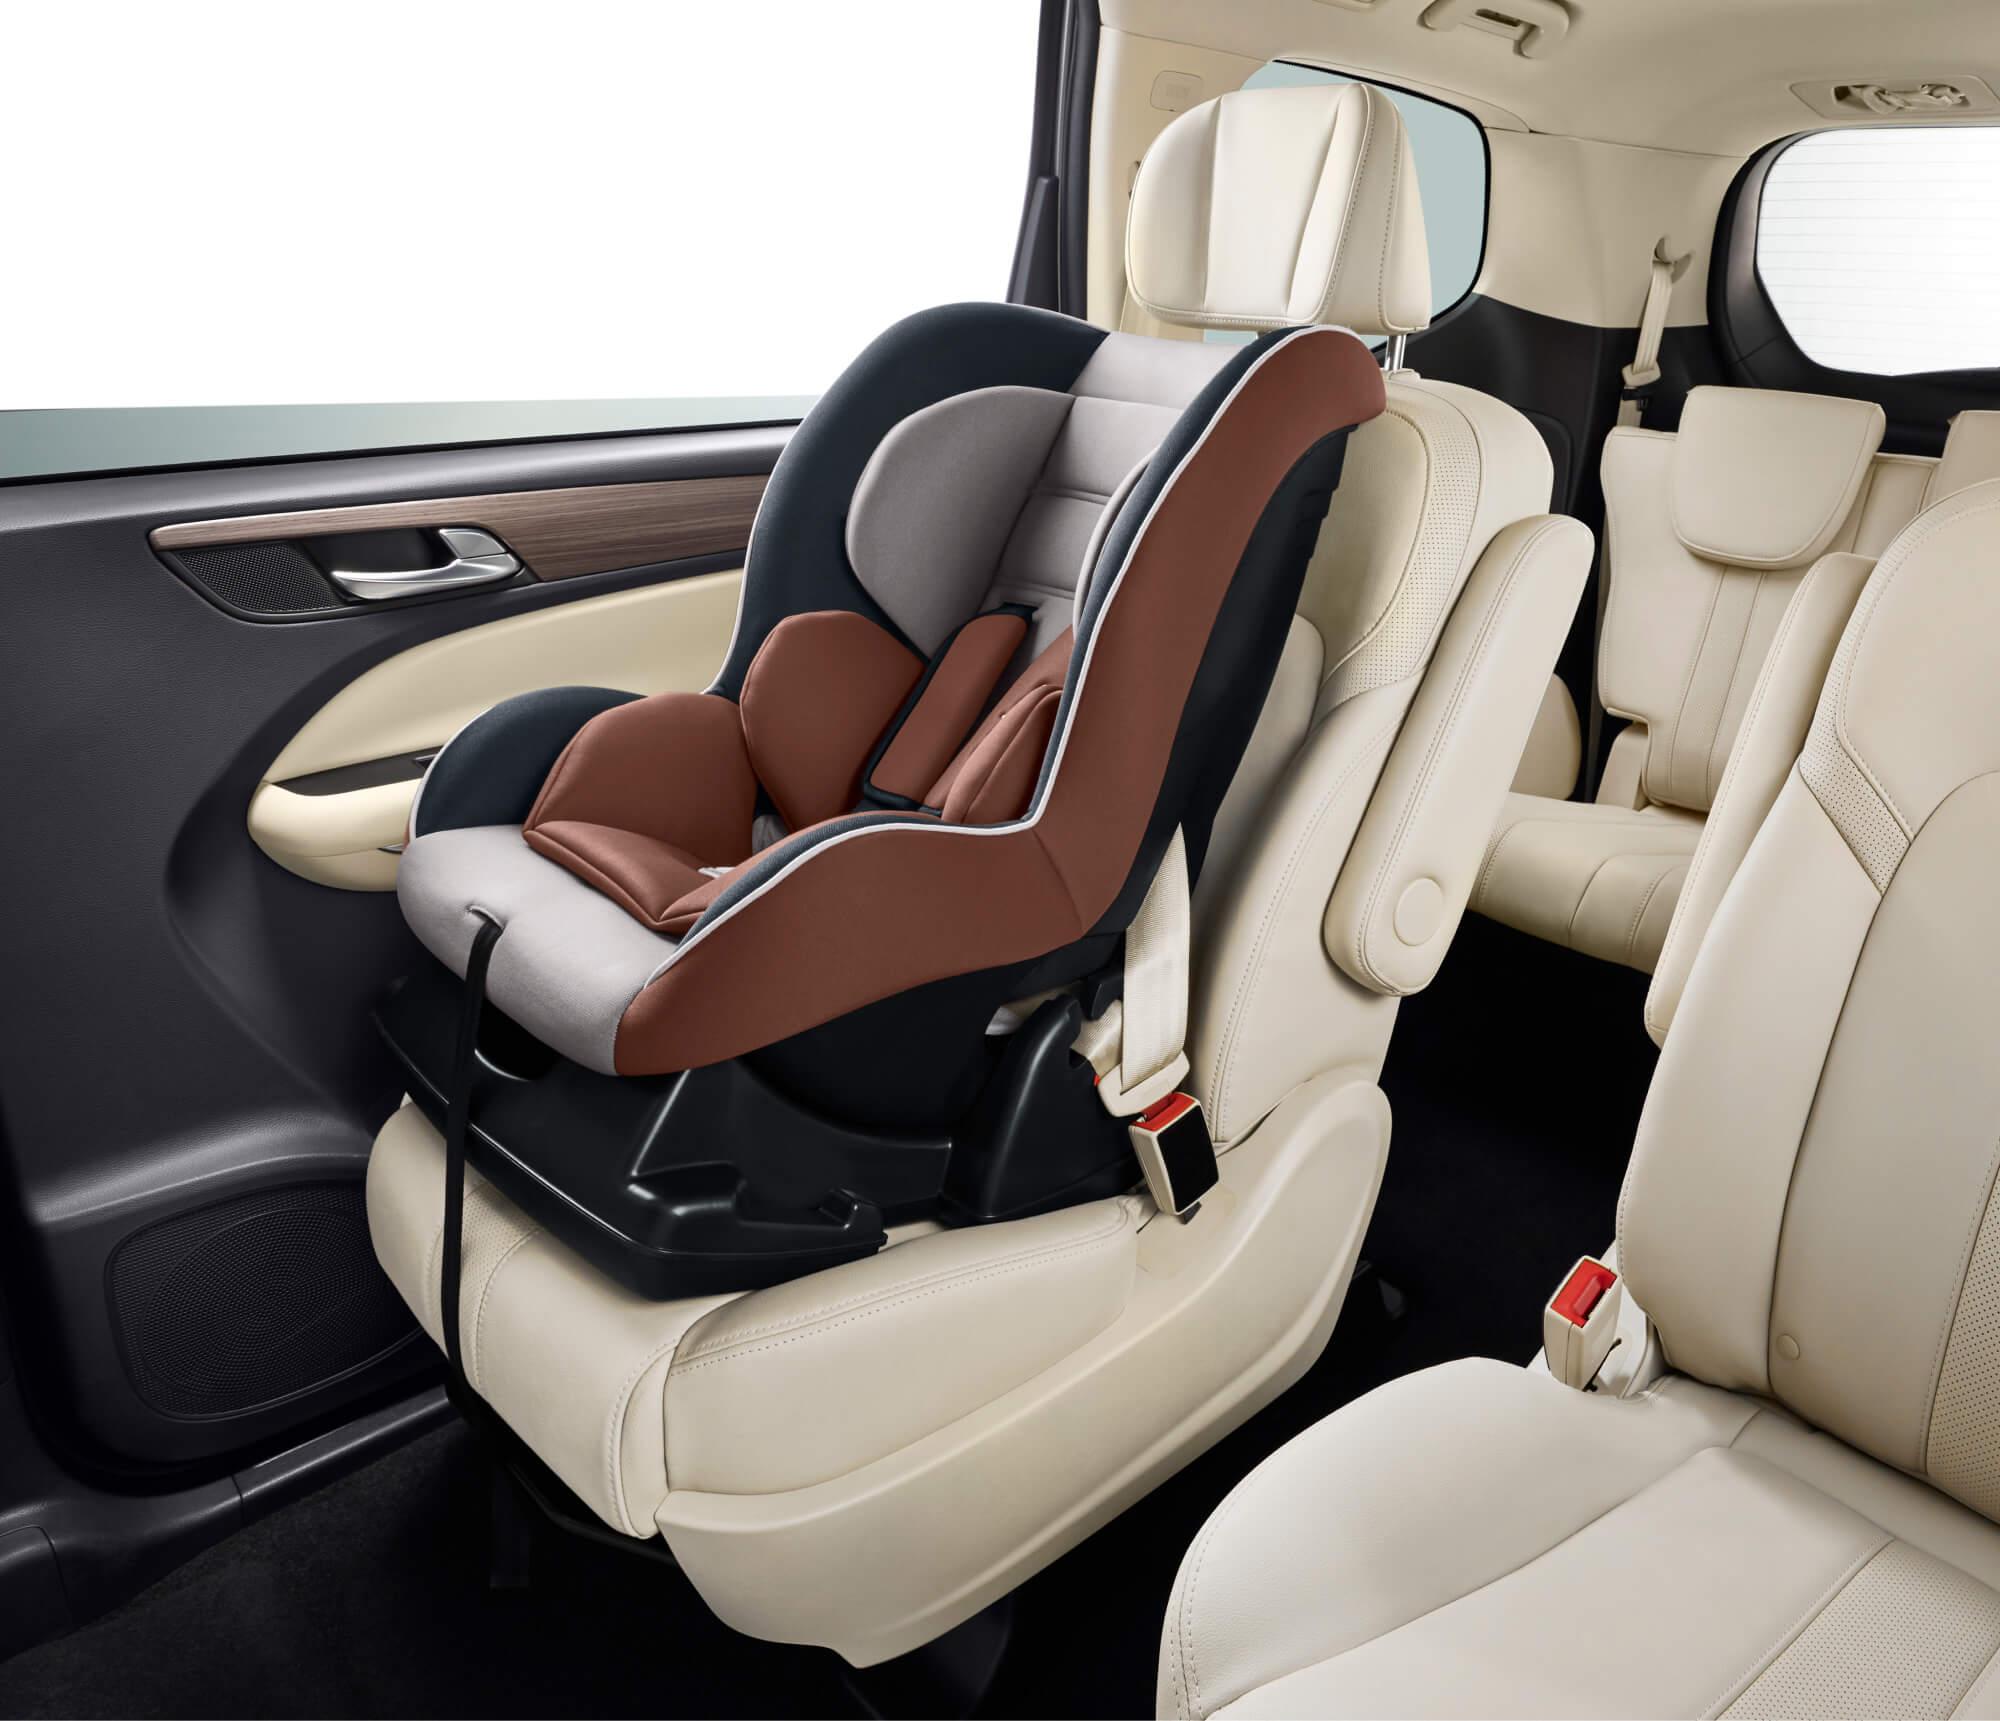 GN6 Child Seat